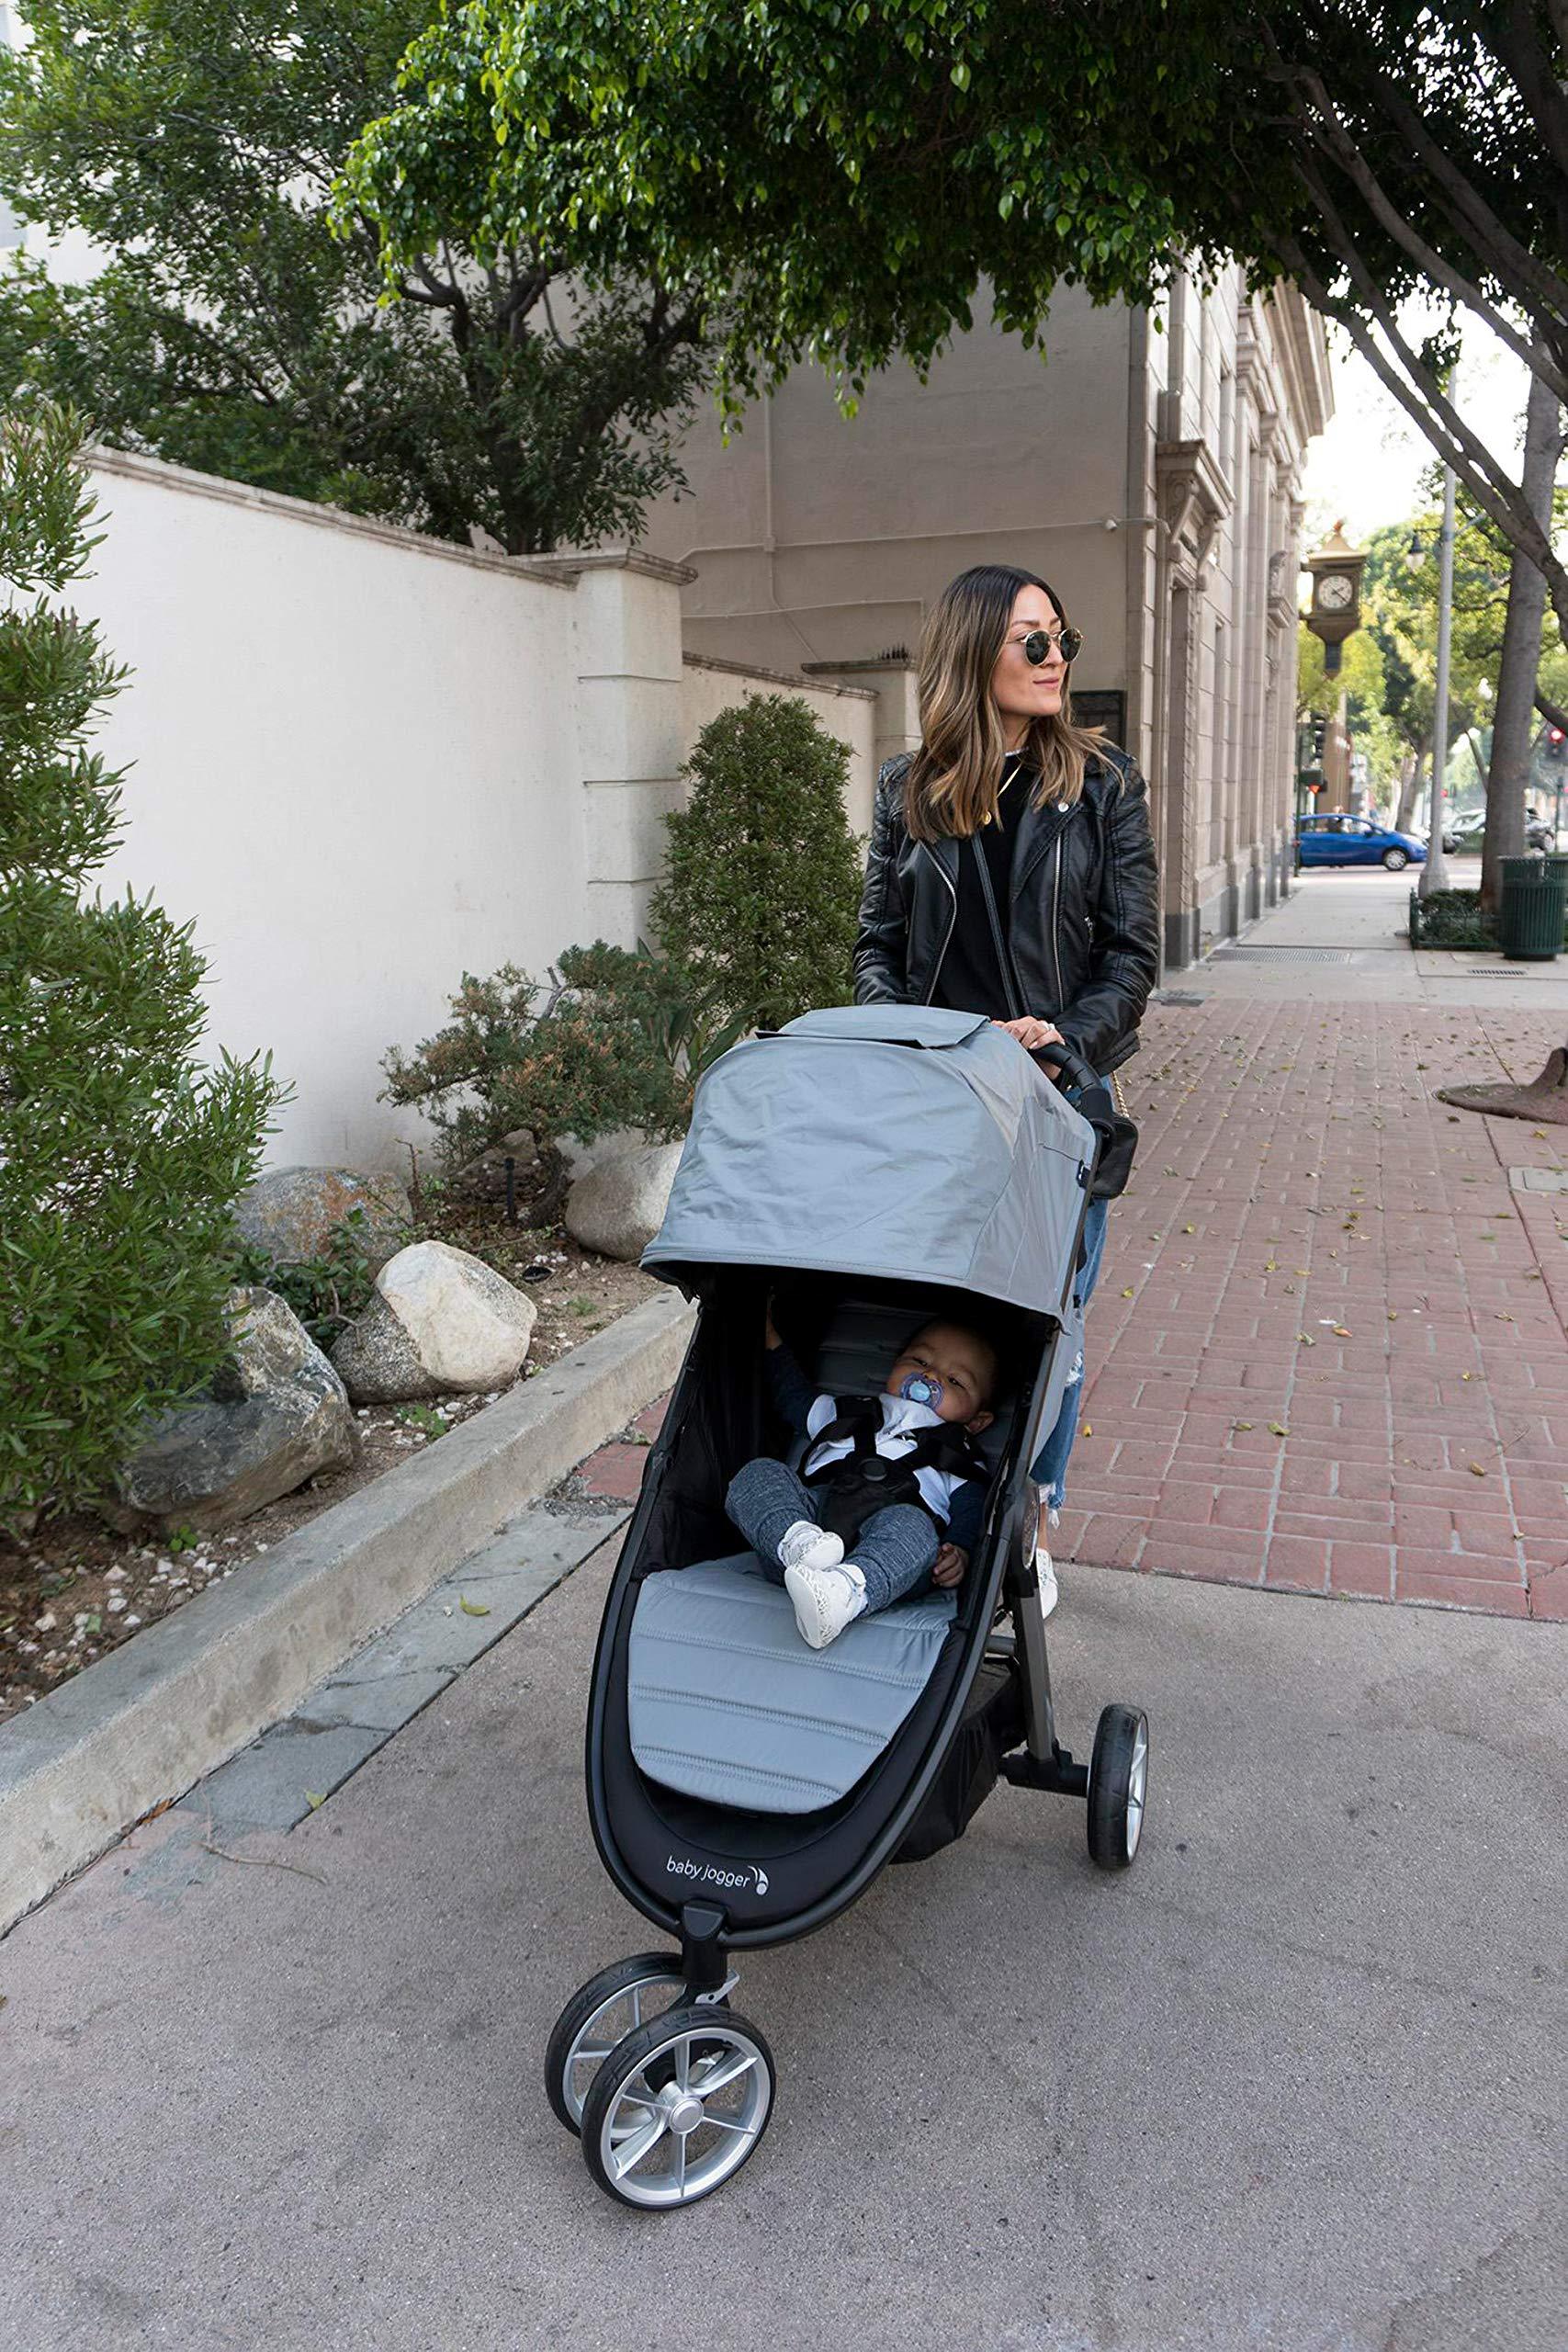 Baby Jogger City Mini 2 Stroller - 2019   Compact, Lightweight Stroller   Quick Fold Baby Stroller, Carbon by Baby Jogger (Image #10)